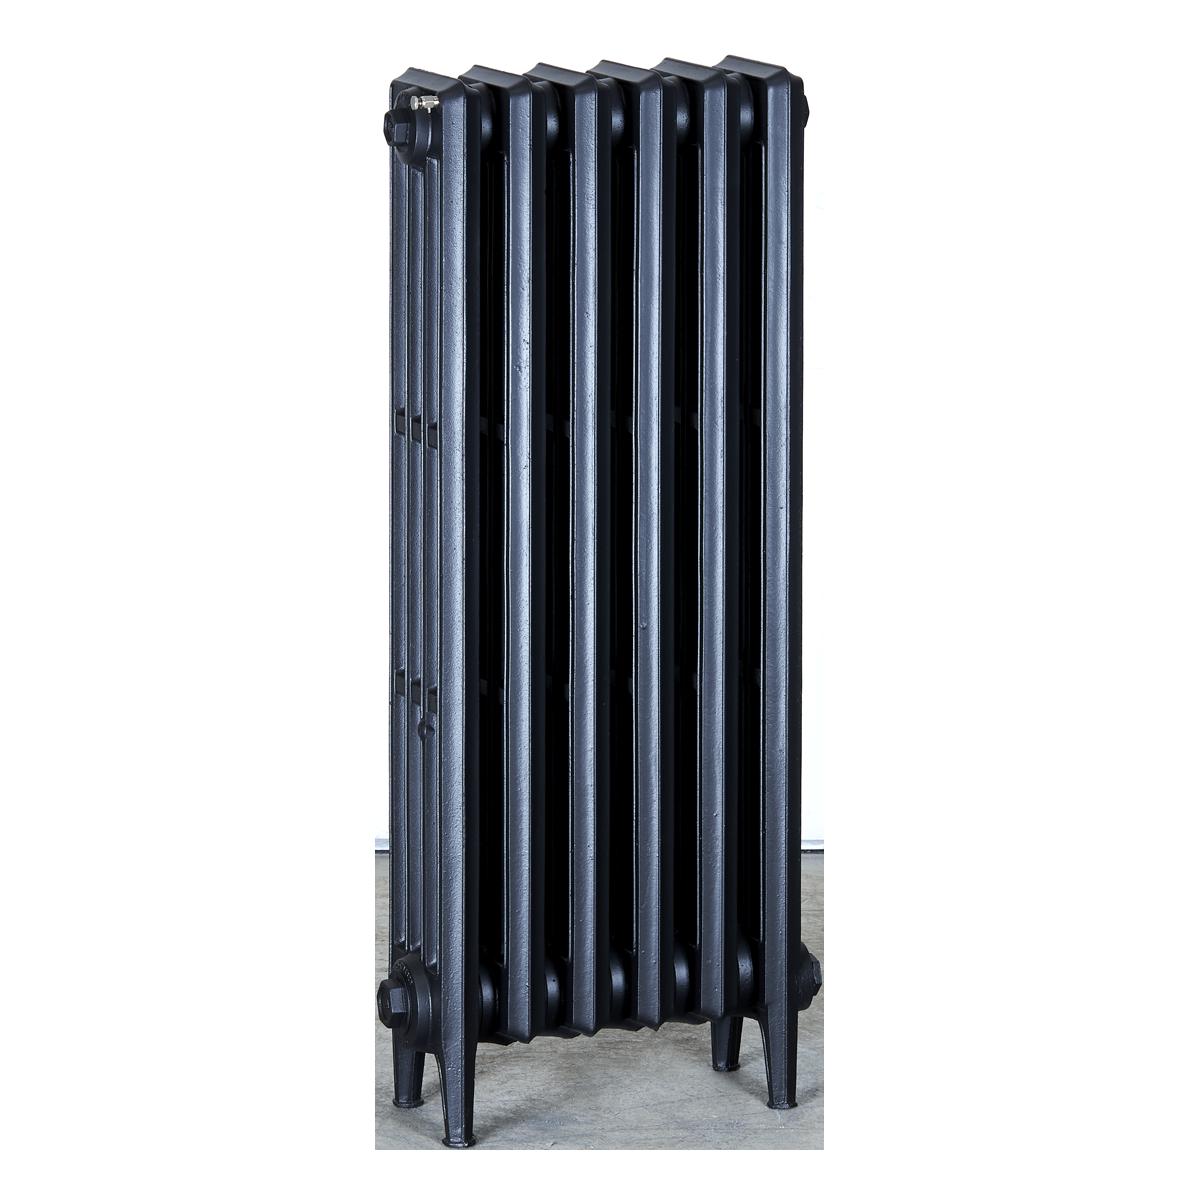 Ironworks Radiators Inc. refurbished cast iron radiator Estelle in Matte Black